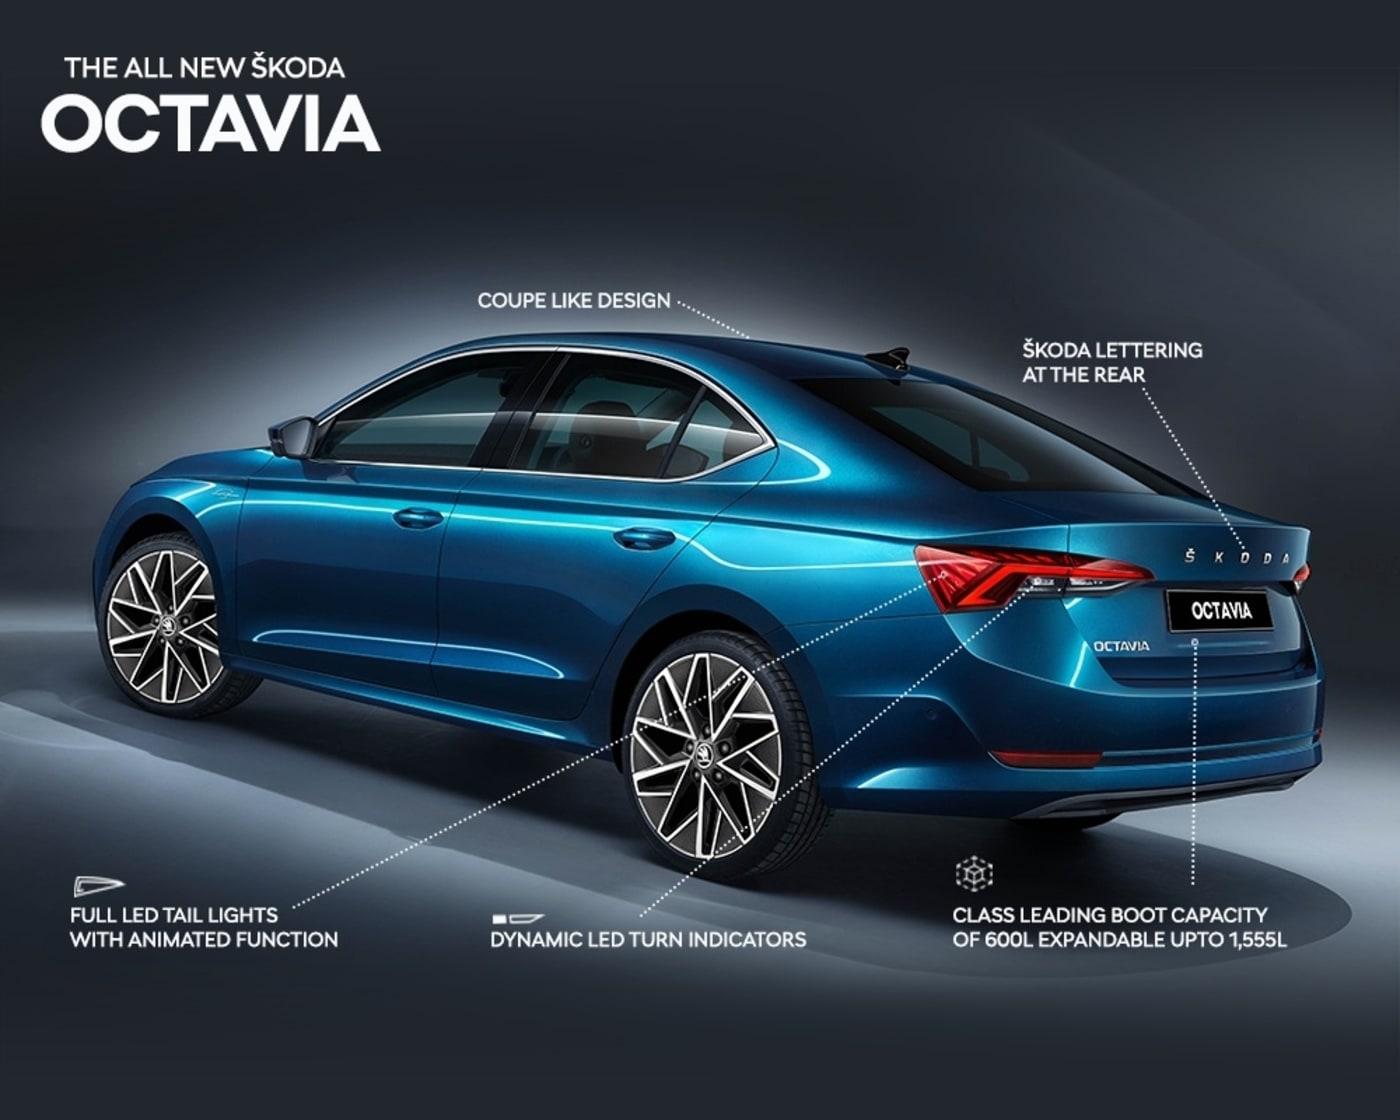 2021 Skoda Octavia exterior details revealed rear